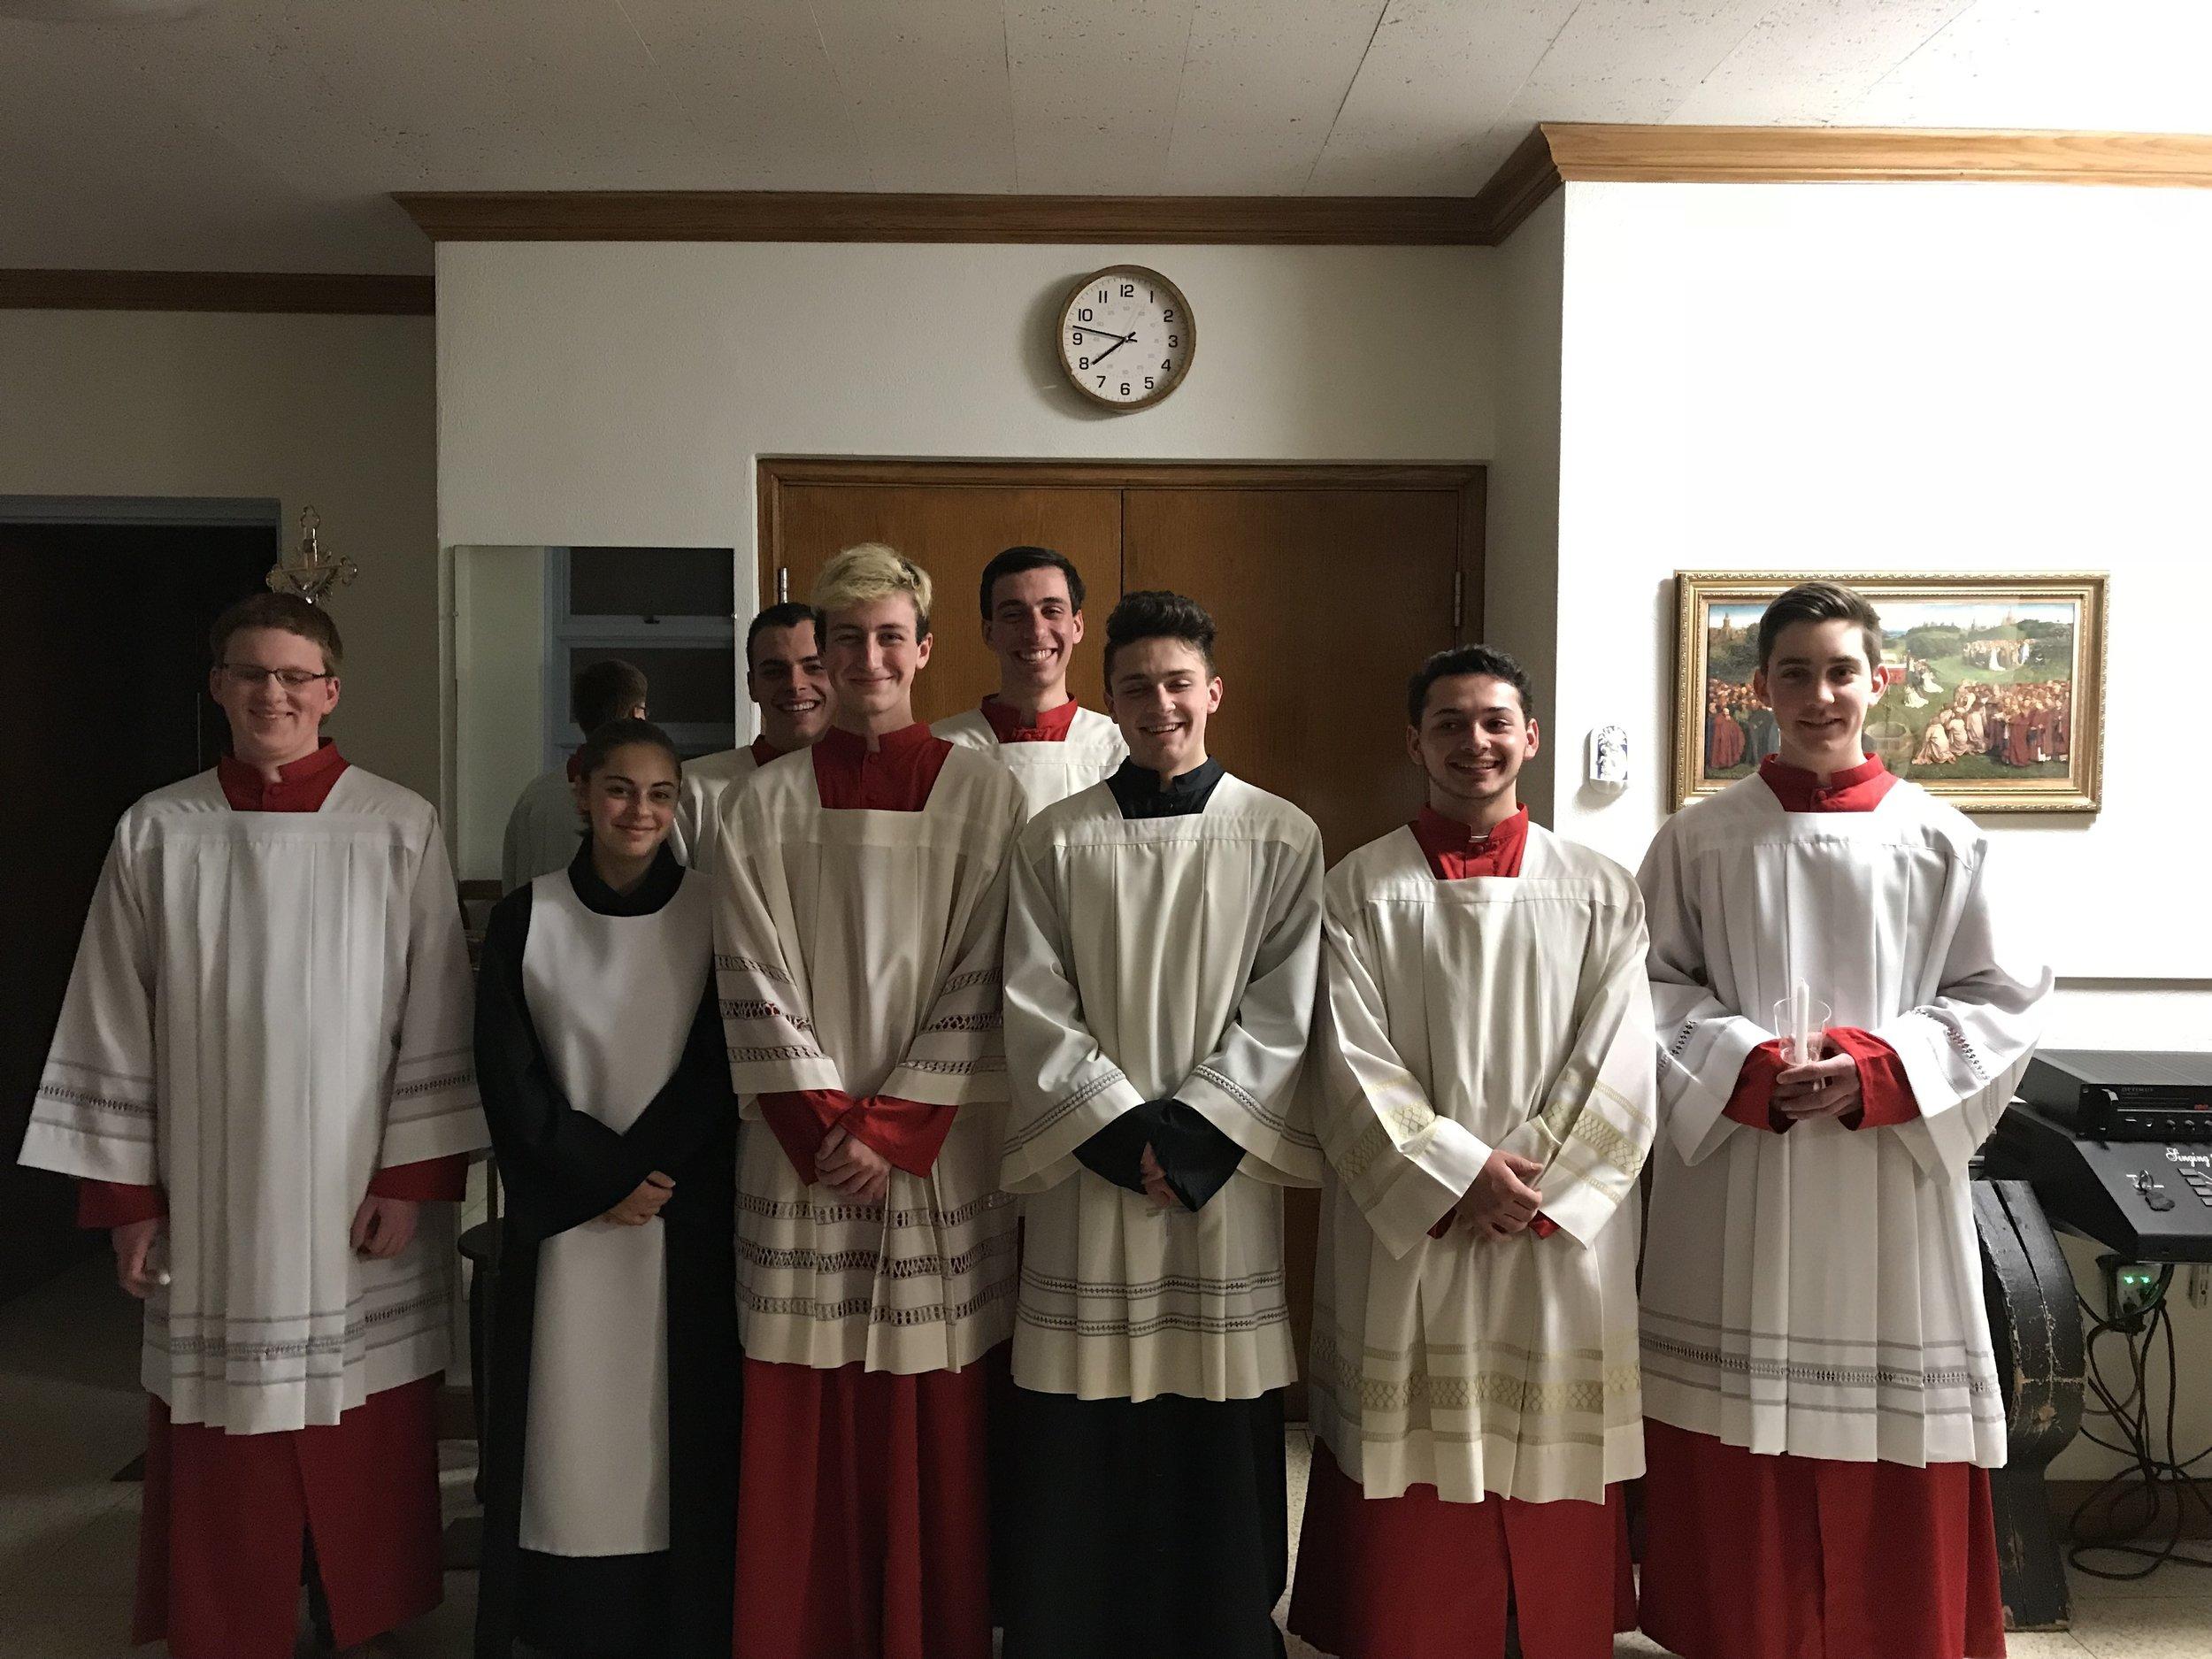 OLM Senior Altar Servers pose in the sacristy prior to Easter Vigil, March 31, 2018.